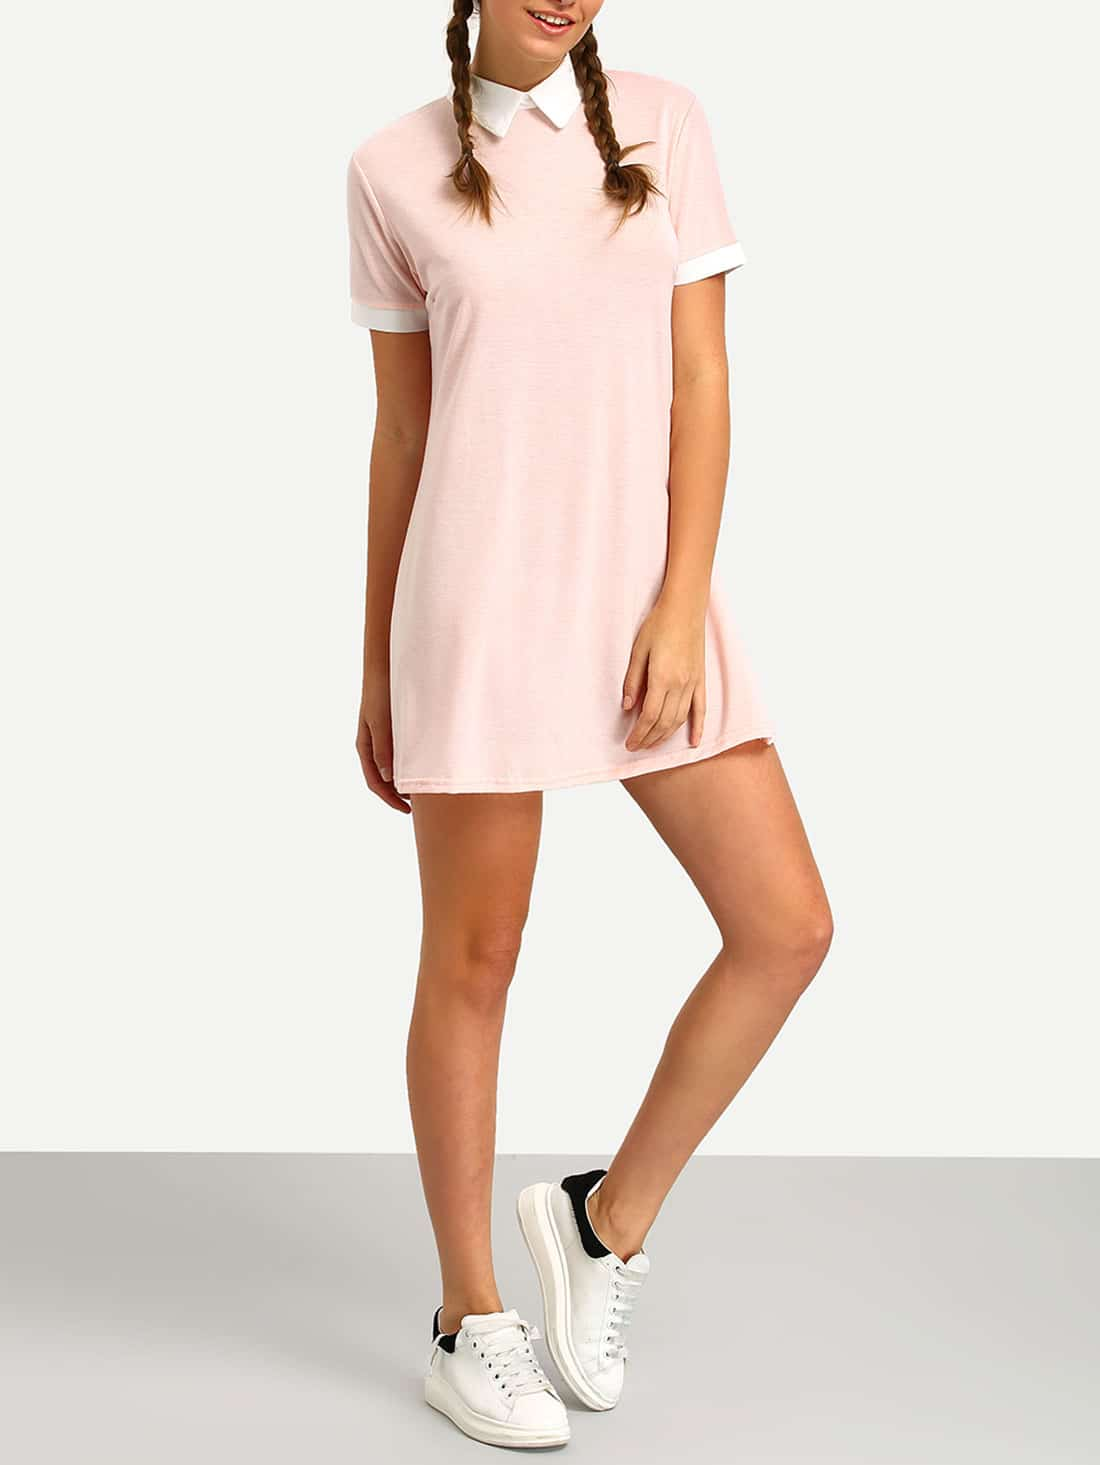 Pink Contrast Collar Shirt Dressfor Women Romwe